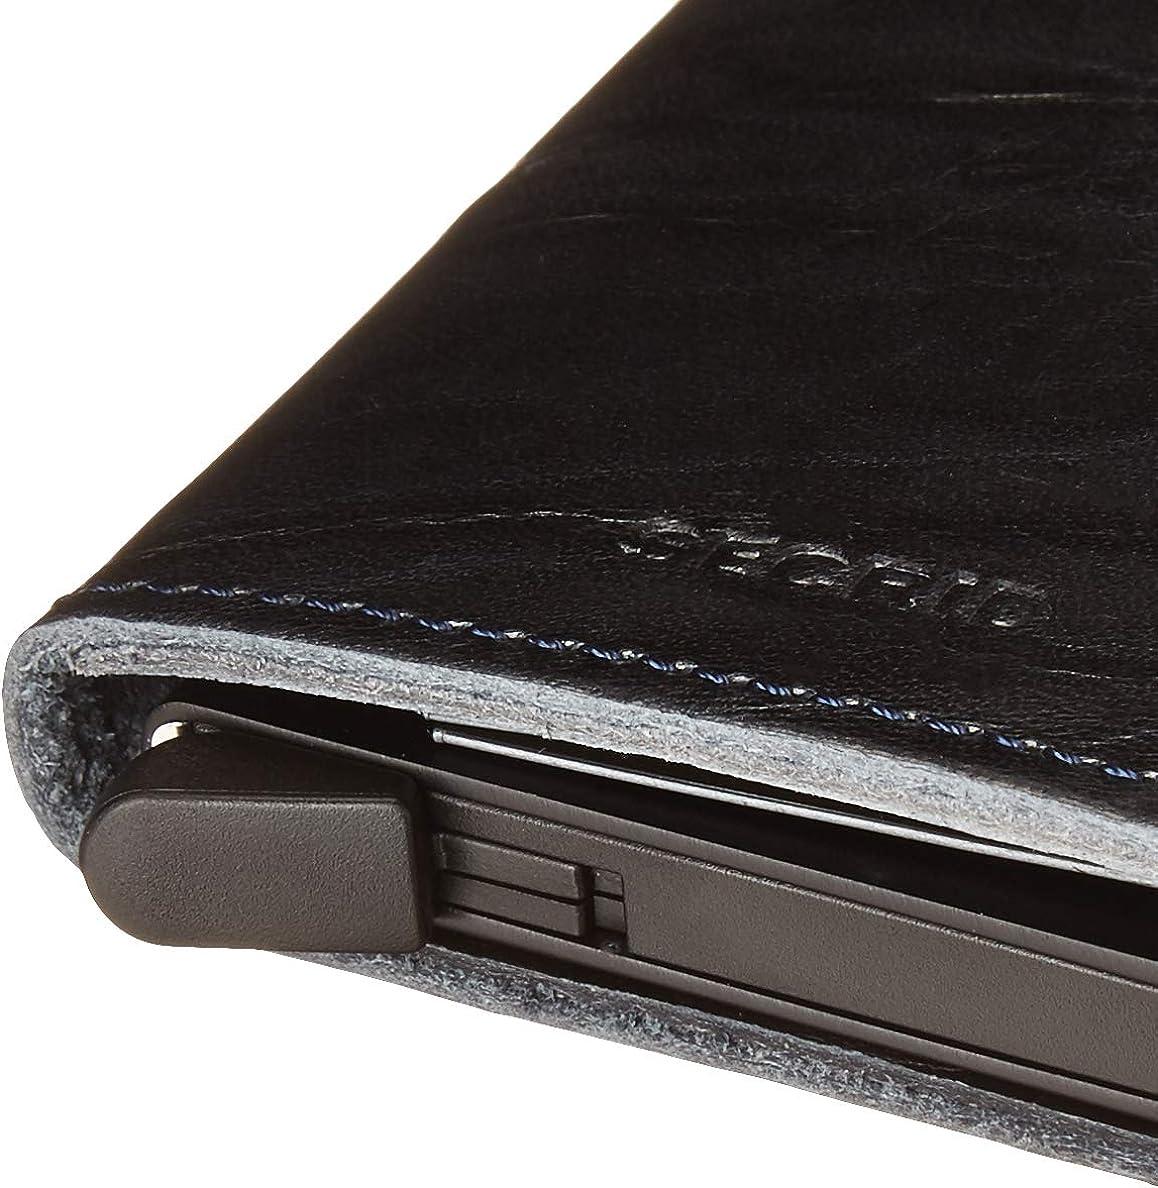 SECRID - Secrid Slim wallet Genuine Leather Dutch Martin RFID Safe Card Case for max 12 cards